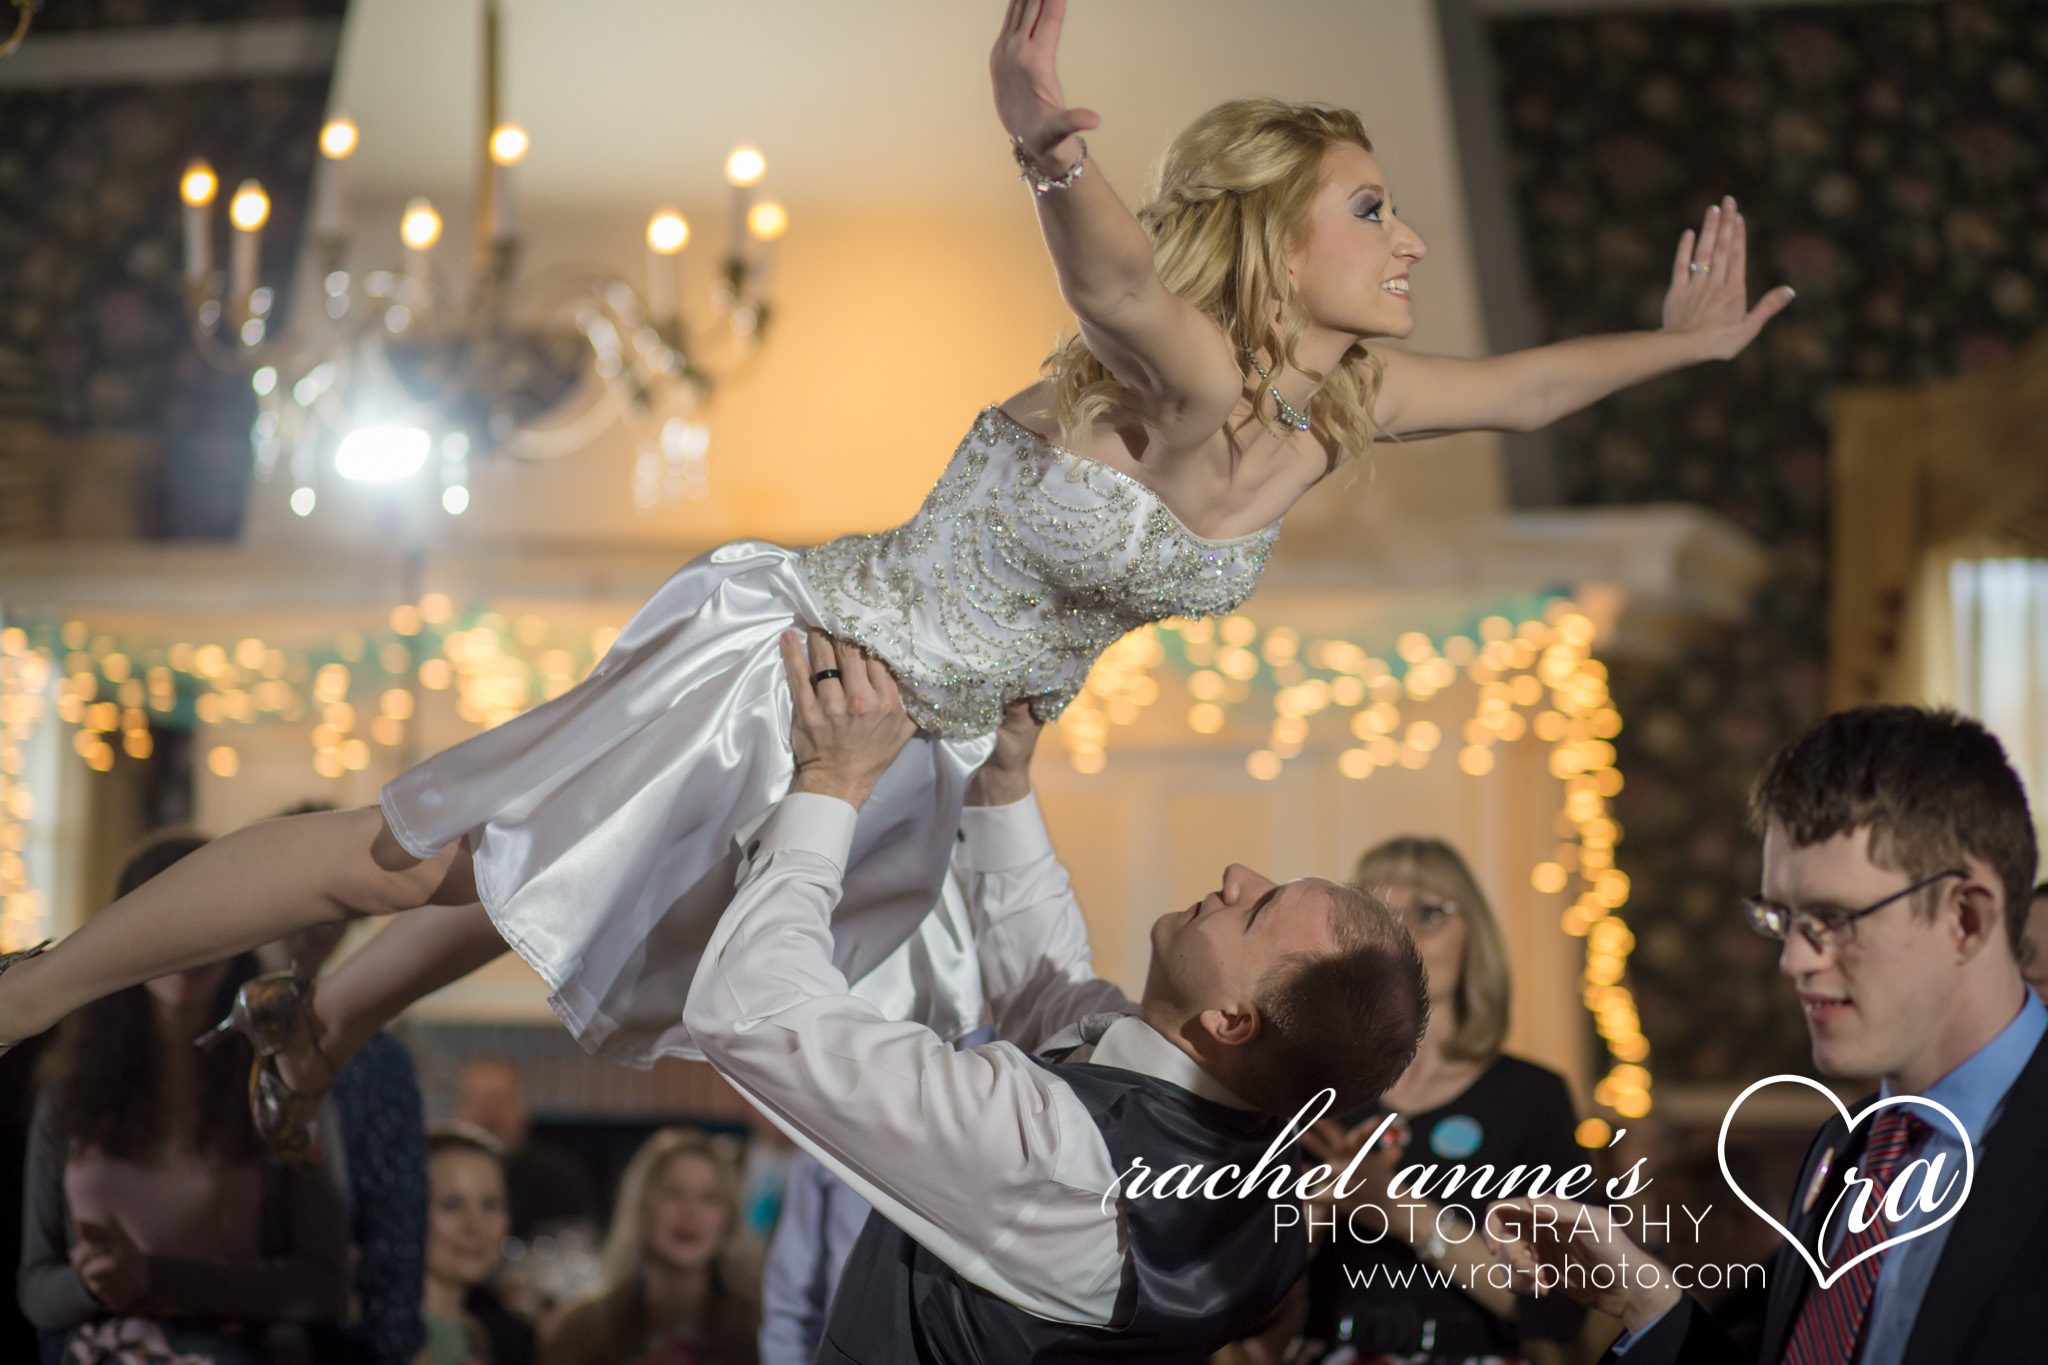 061-JKS-WEDDINGS-THE-FRANKLIN-PA.jpg